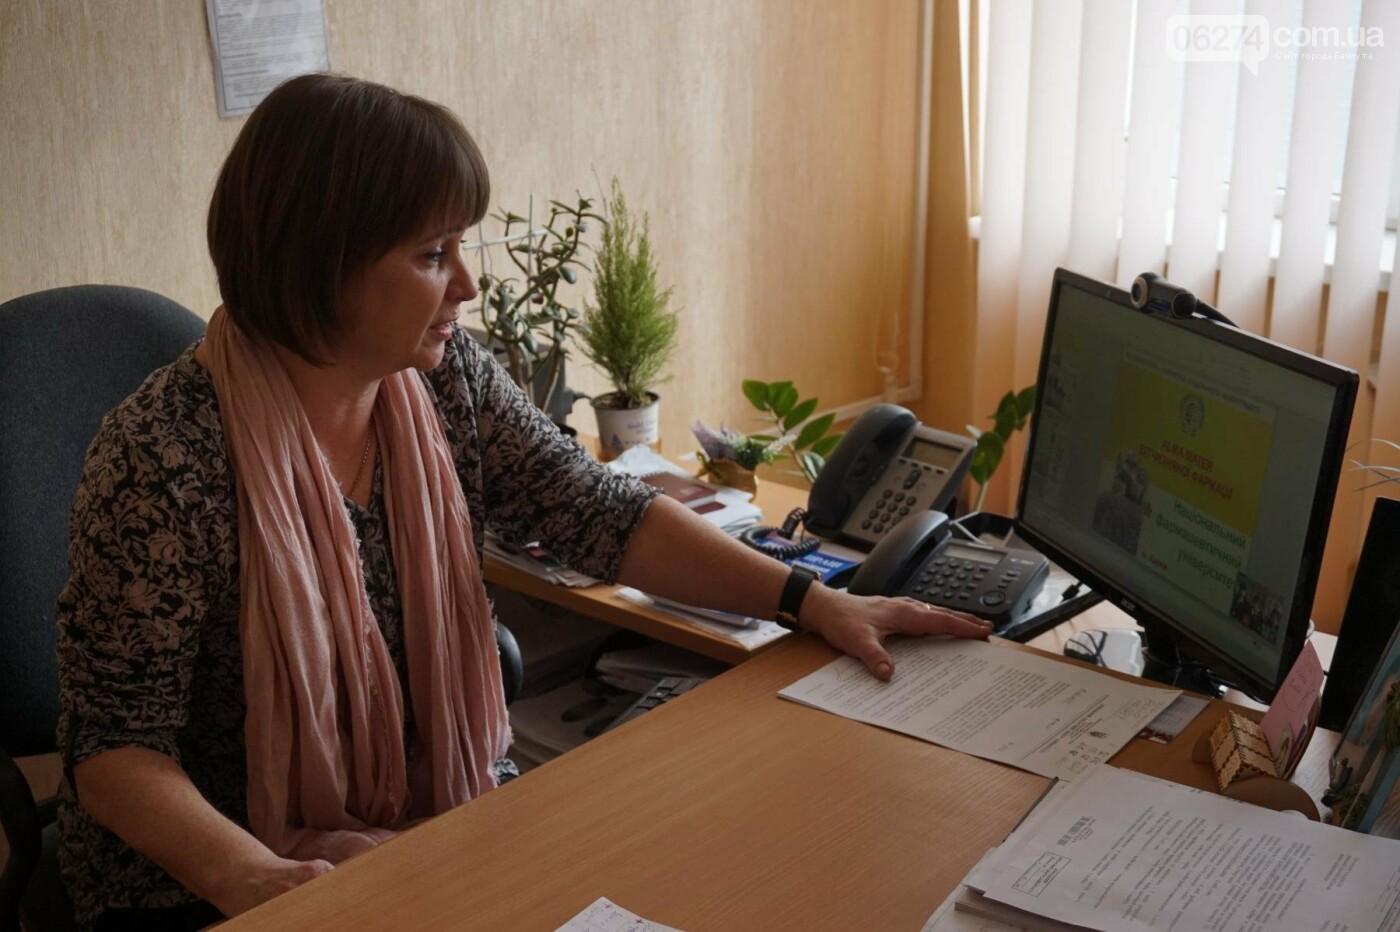 Харьковский фармуниверситет провел презентацию для абитуриентов Бахмута, фото-2